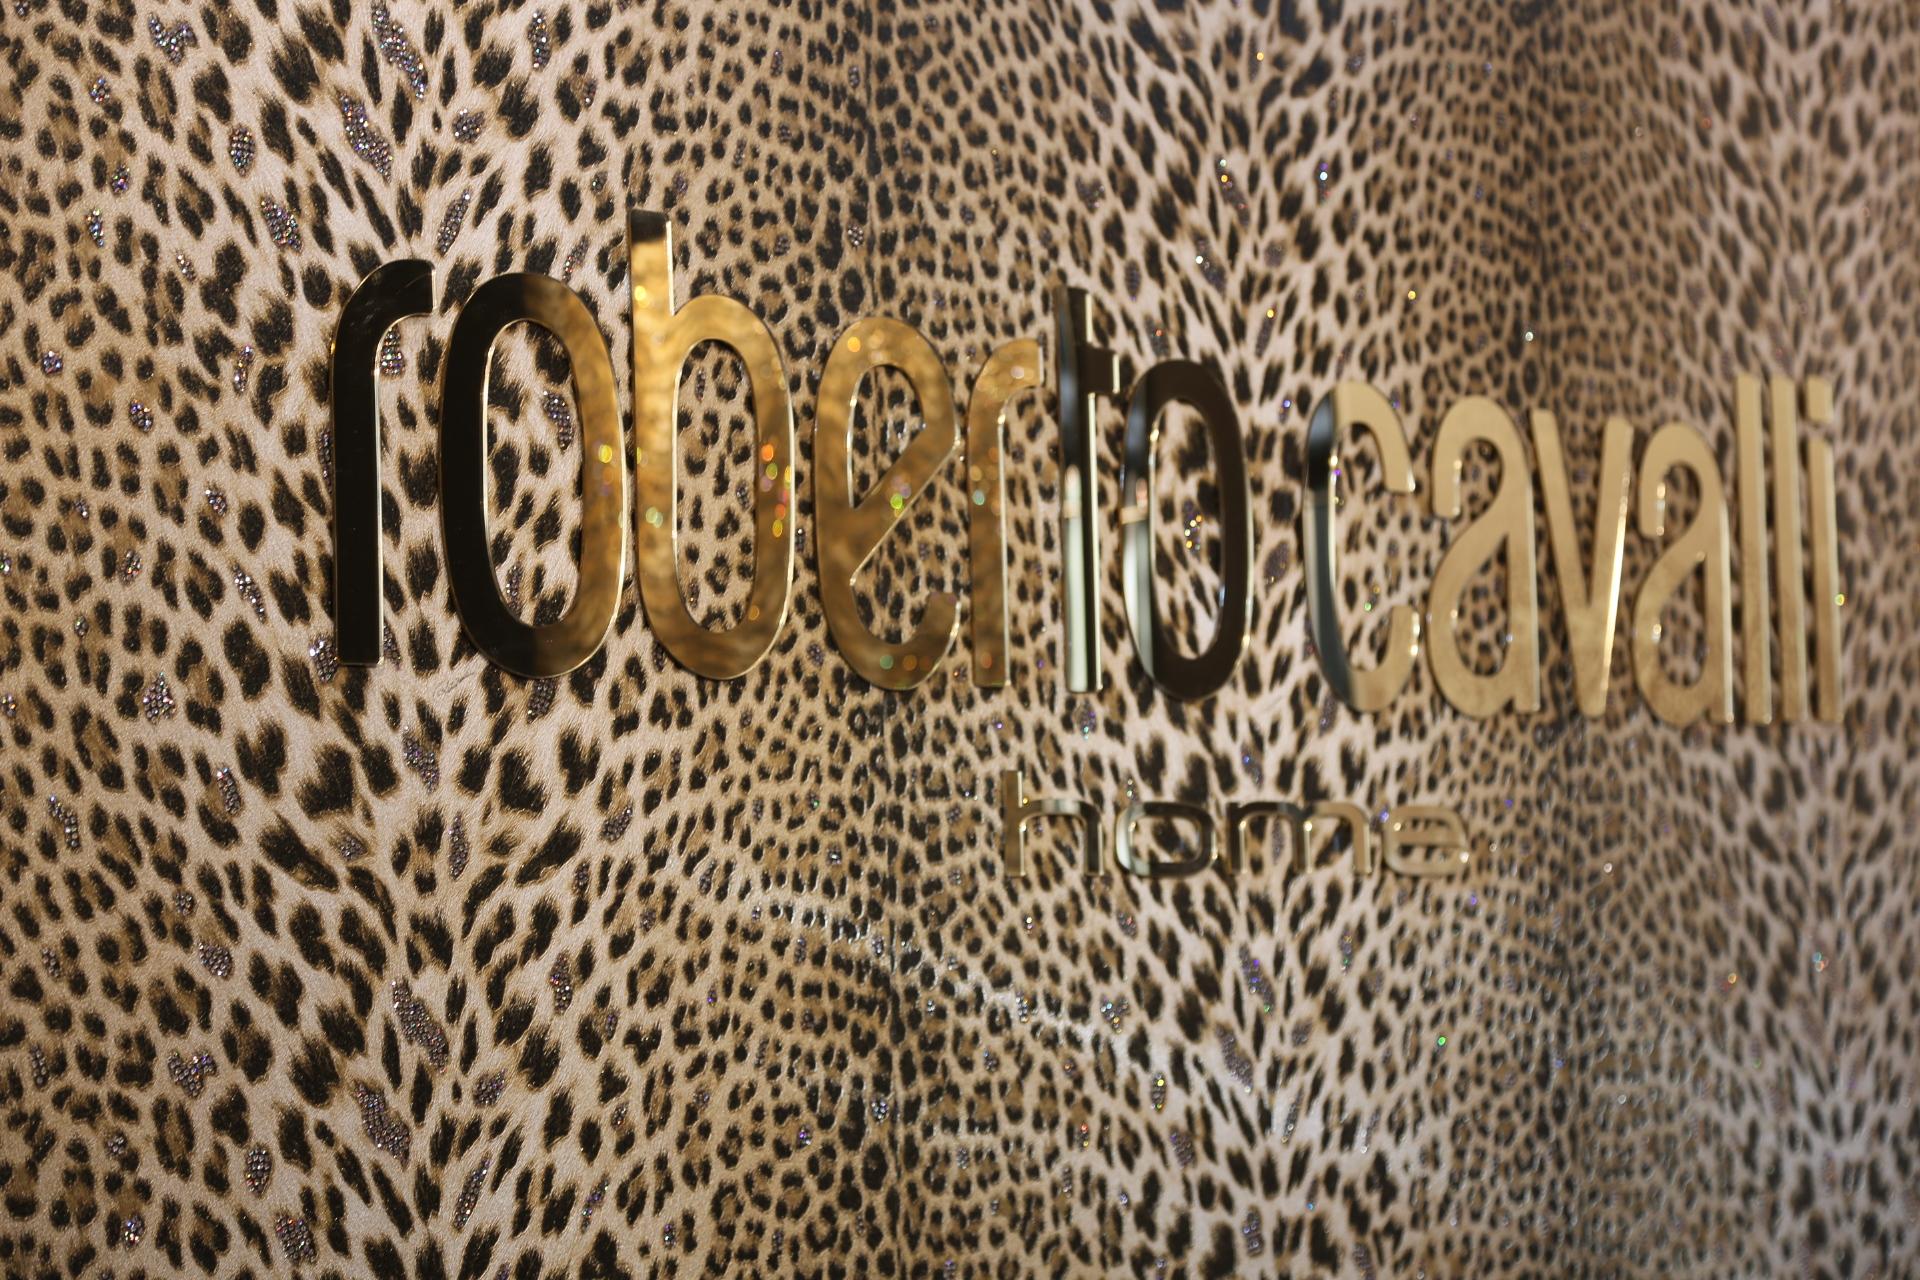 Second ROBERTO CAVALLI Wallpaper collection HTX 2014 1920x1280